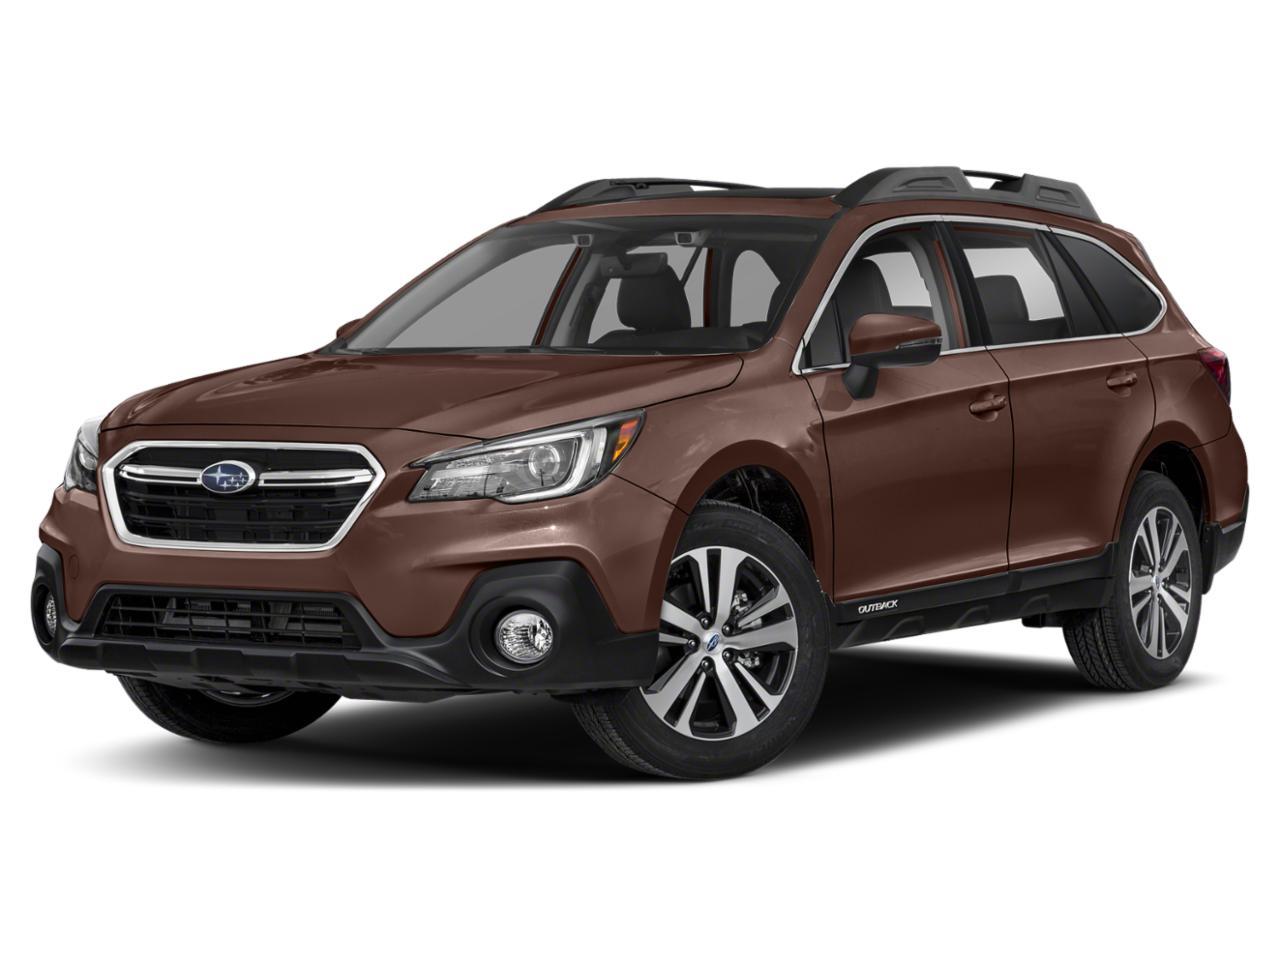 2019 Subaru Outback 3.6R SUV Slide